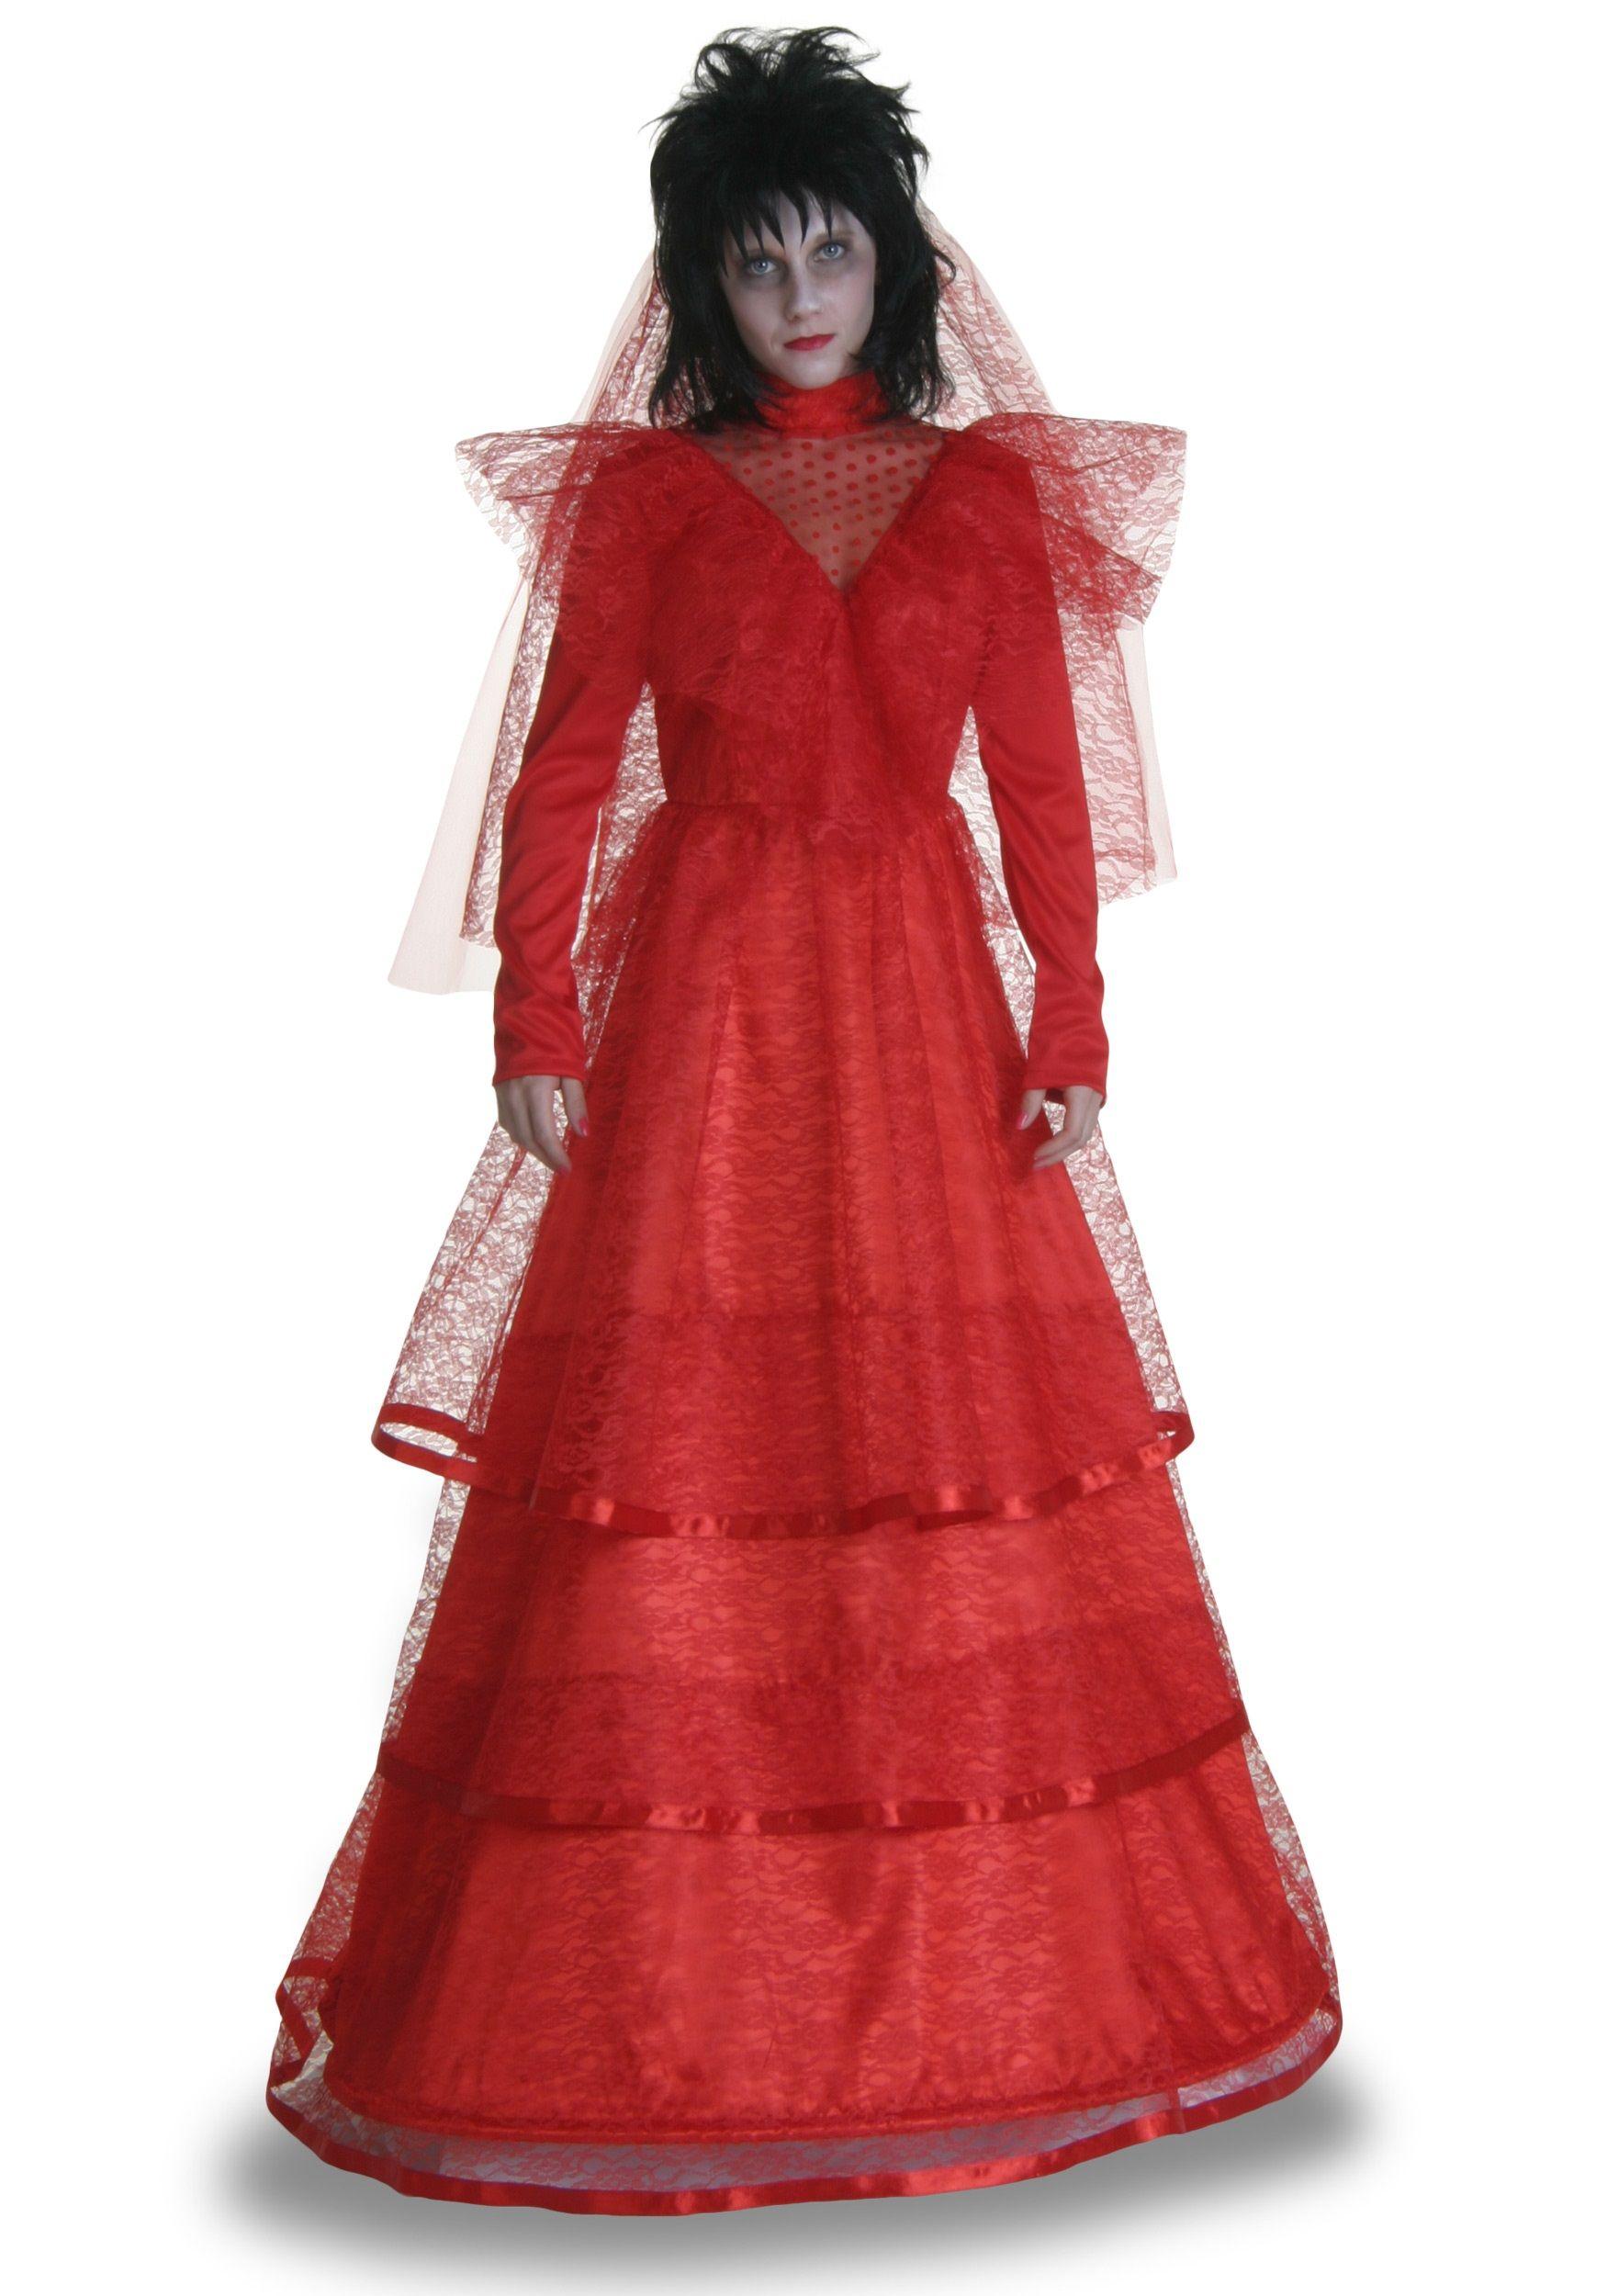 halloween wedding dresses Beetlejuice Lydia Deetz s Red Gothic Wedding Dress Halloween Party with Tim Burton